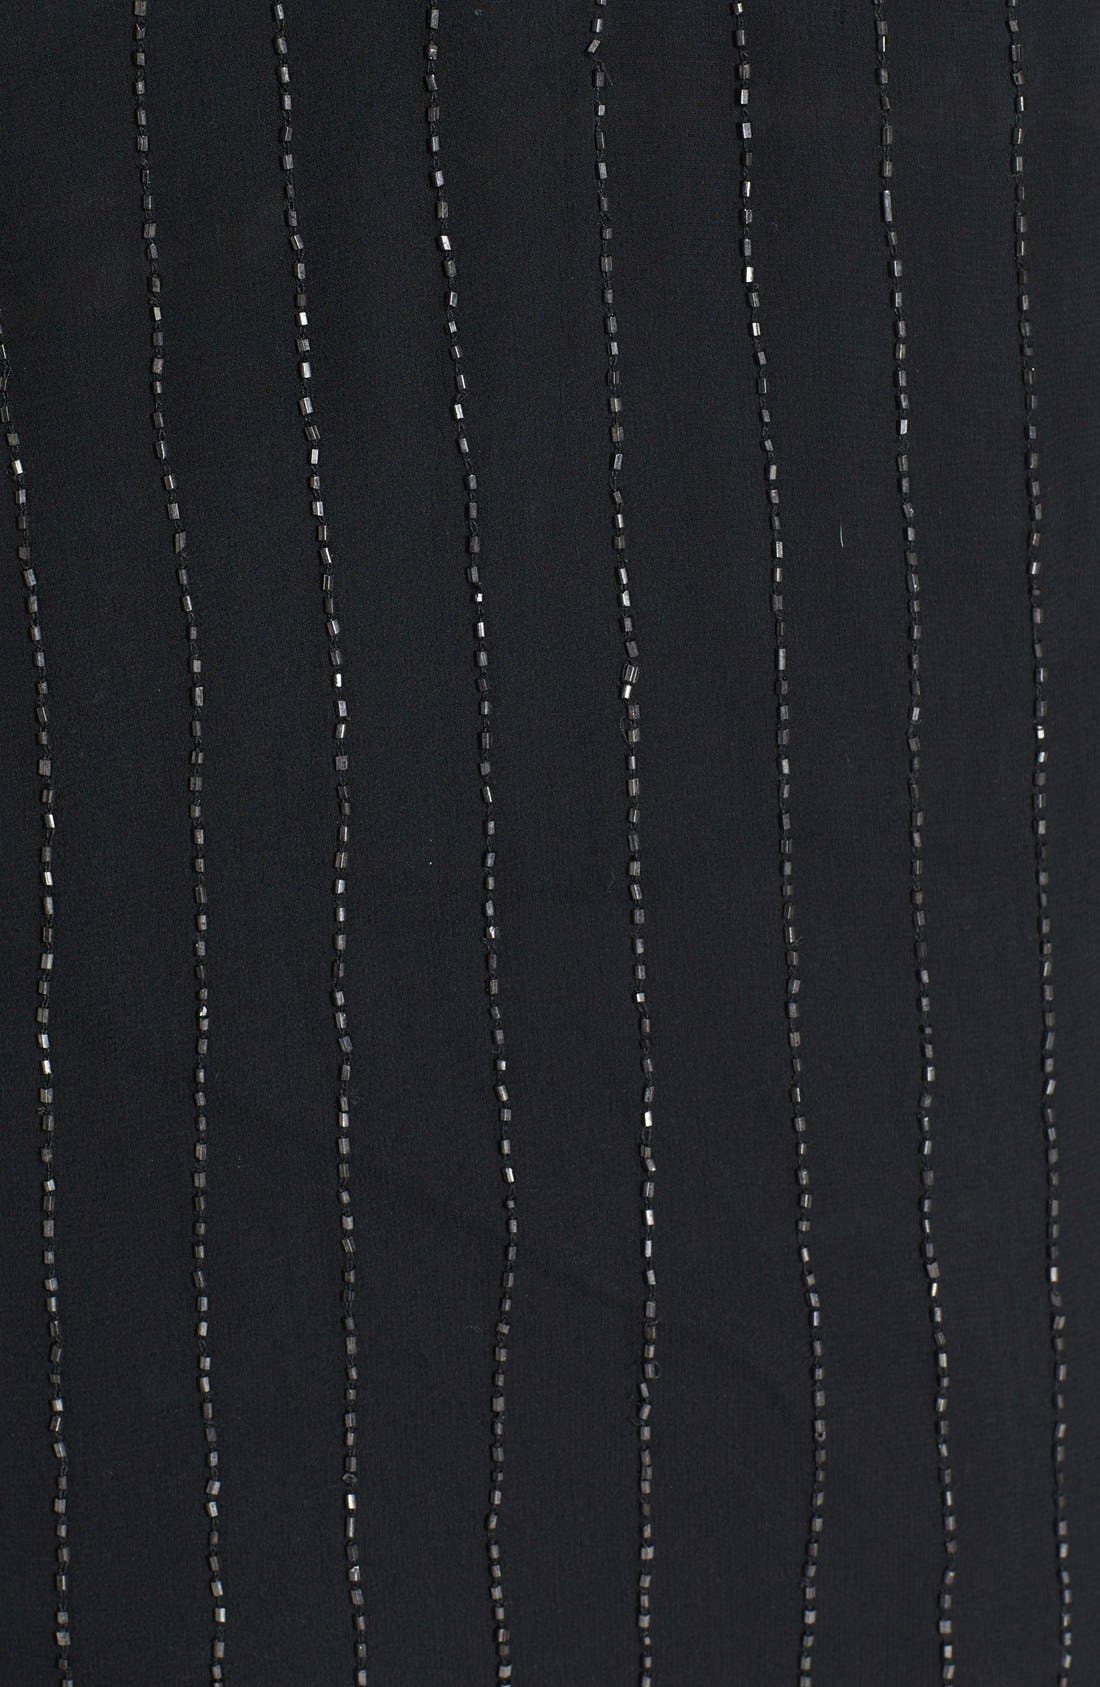 JOIE,                             'Mendira' Beaded Silk Top,                             Alternate thumbnail 3, color,                             002